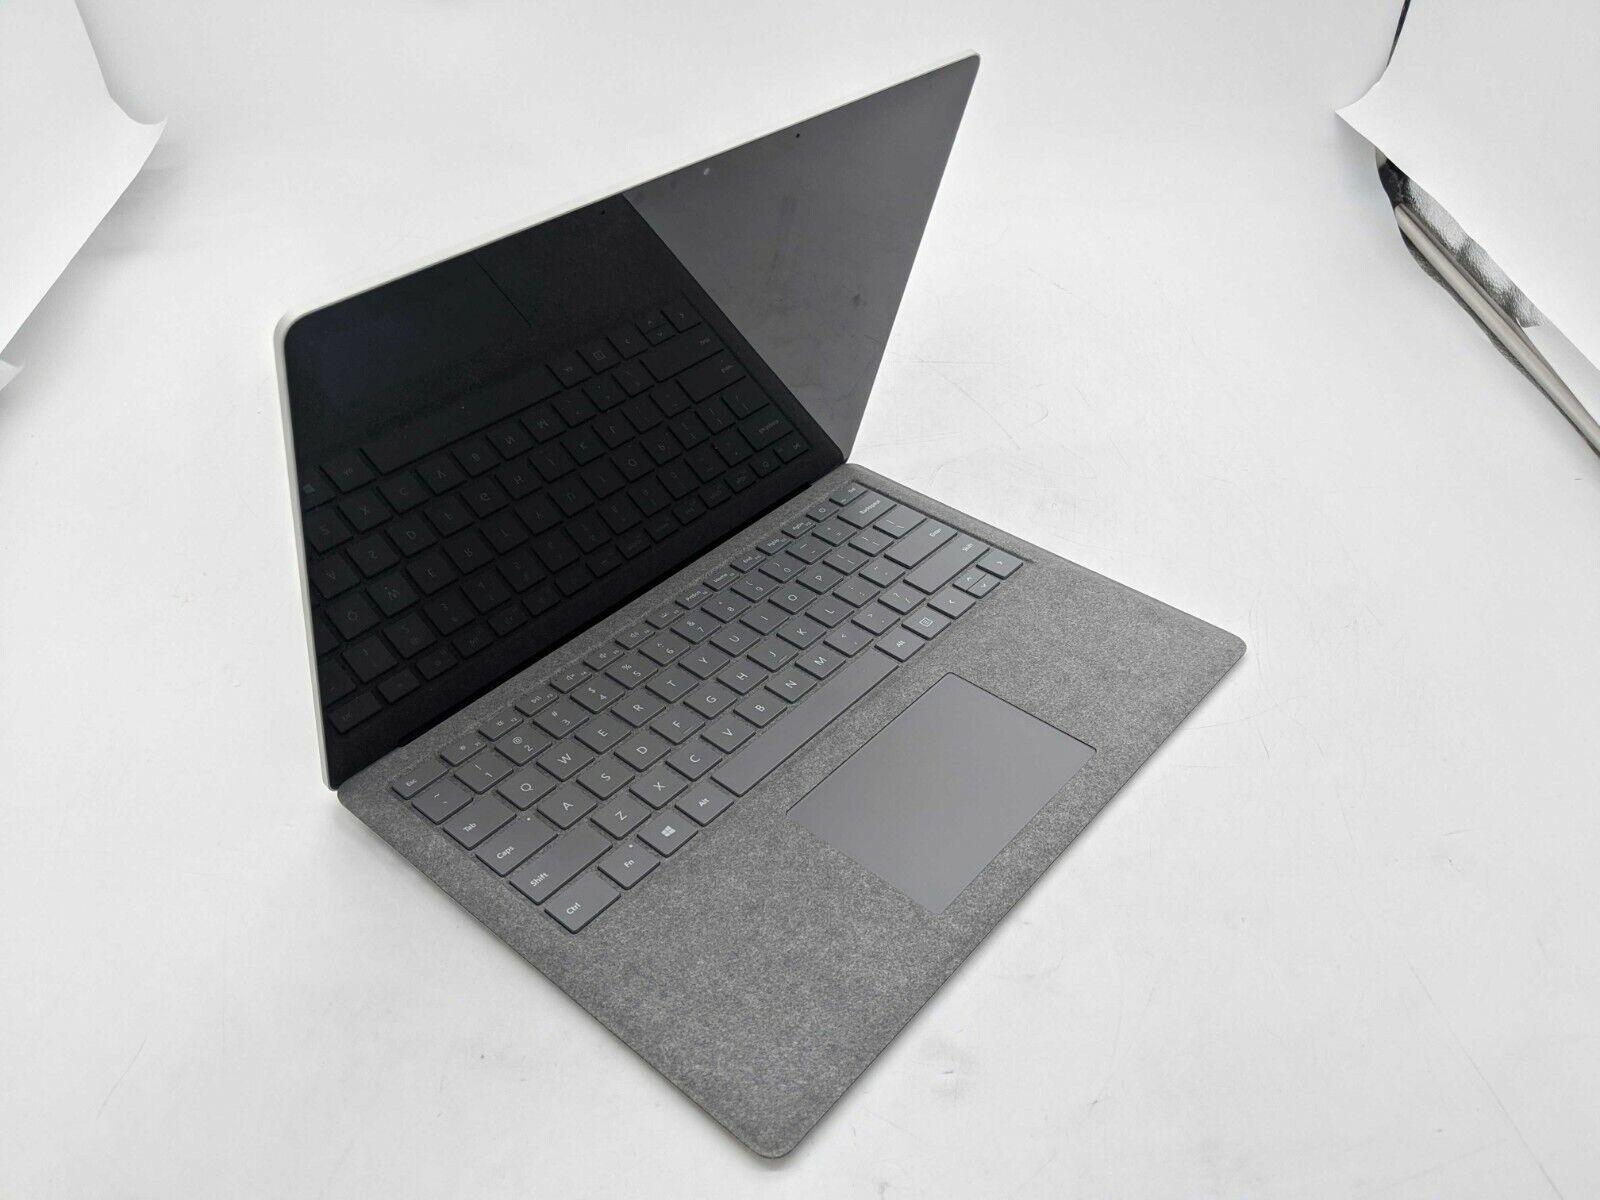 Laptop Windows - Microsoft Surface Laptop 2 Intel i5 8GB DDR4 Windows 10 256GB SSD - CL5682